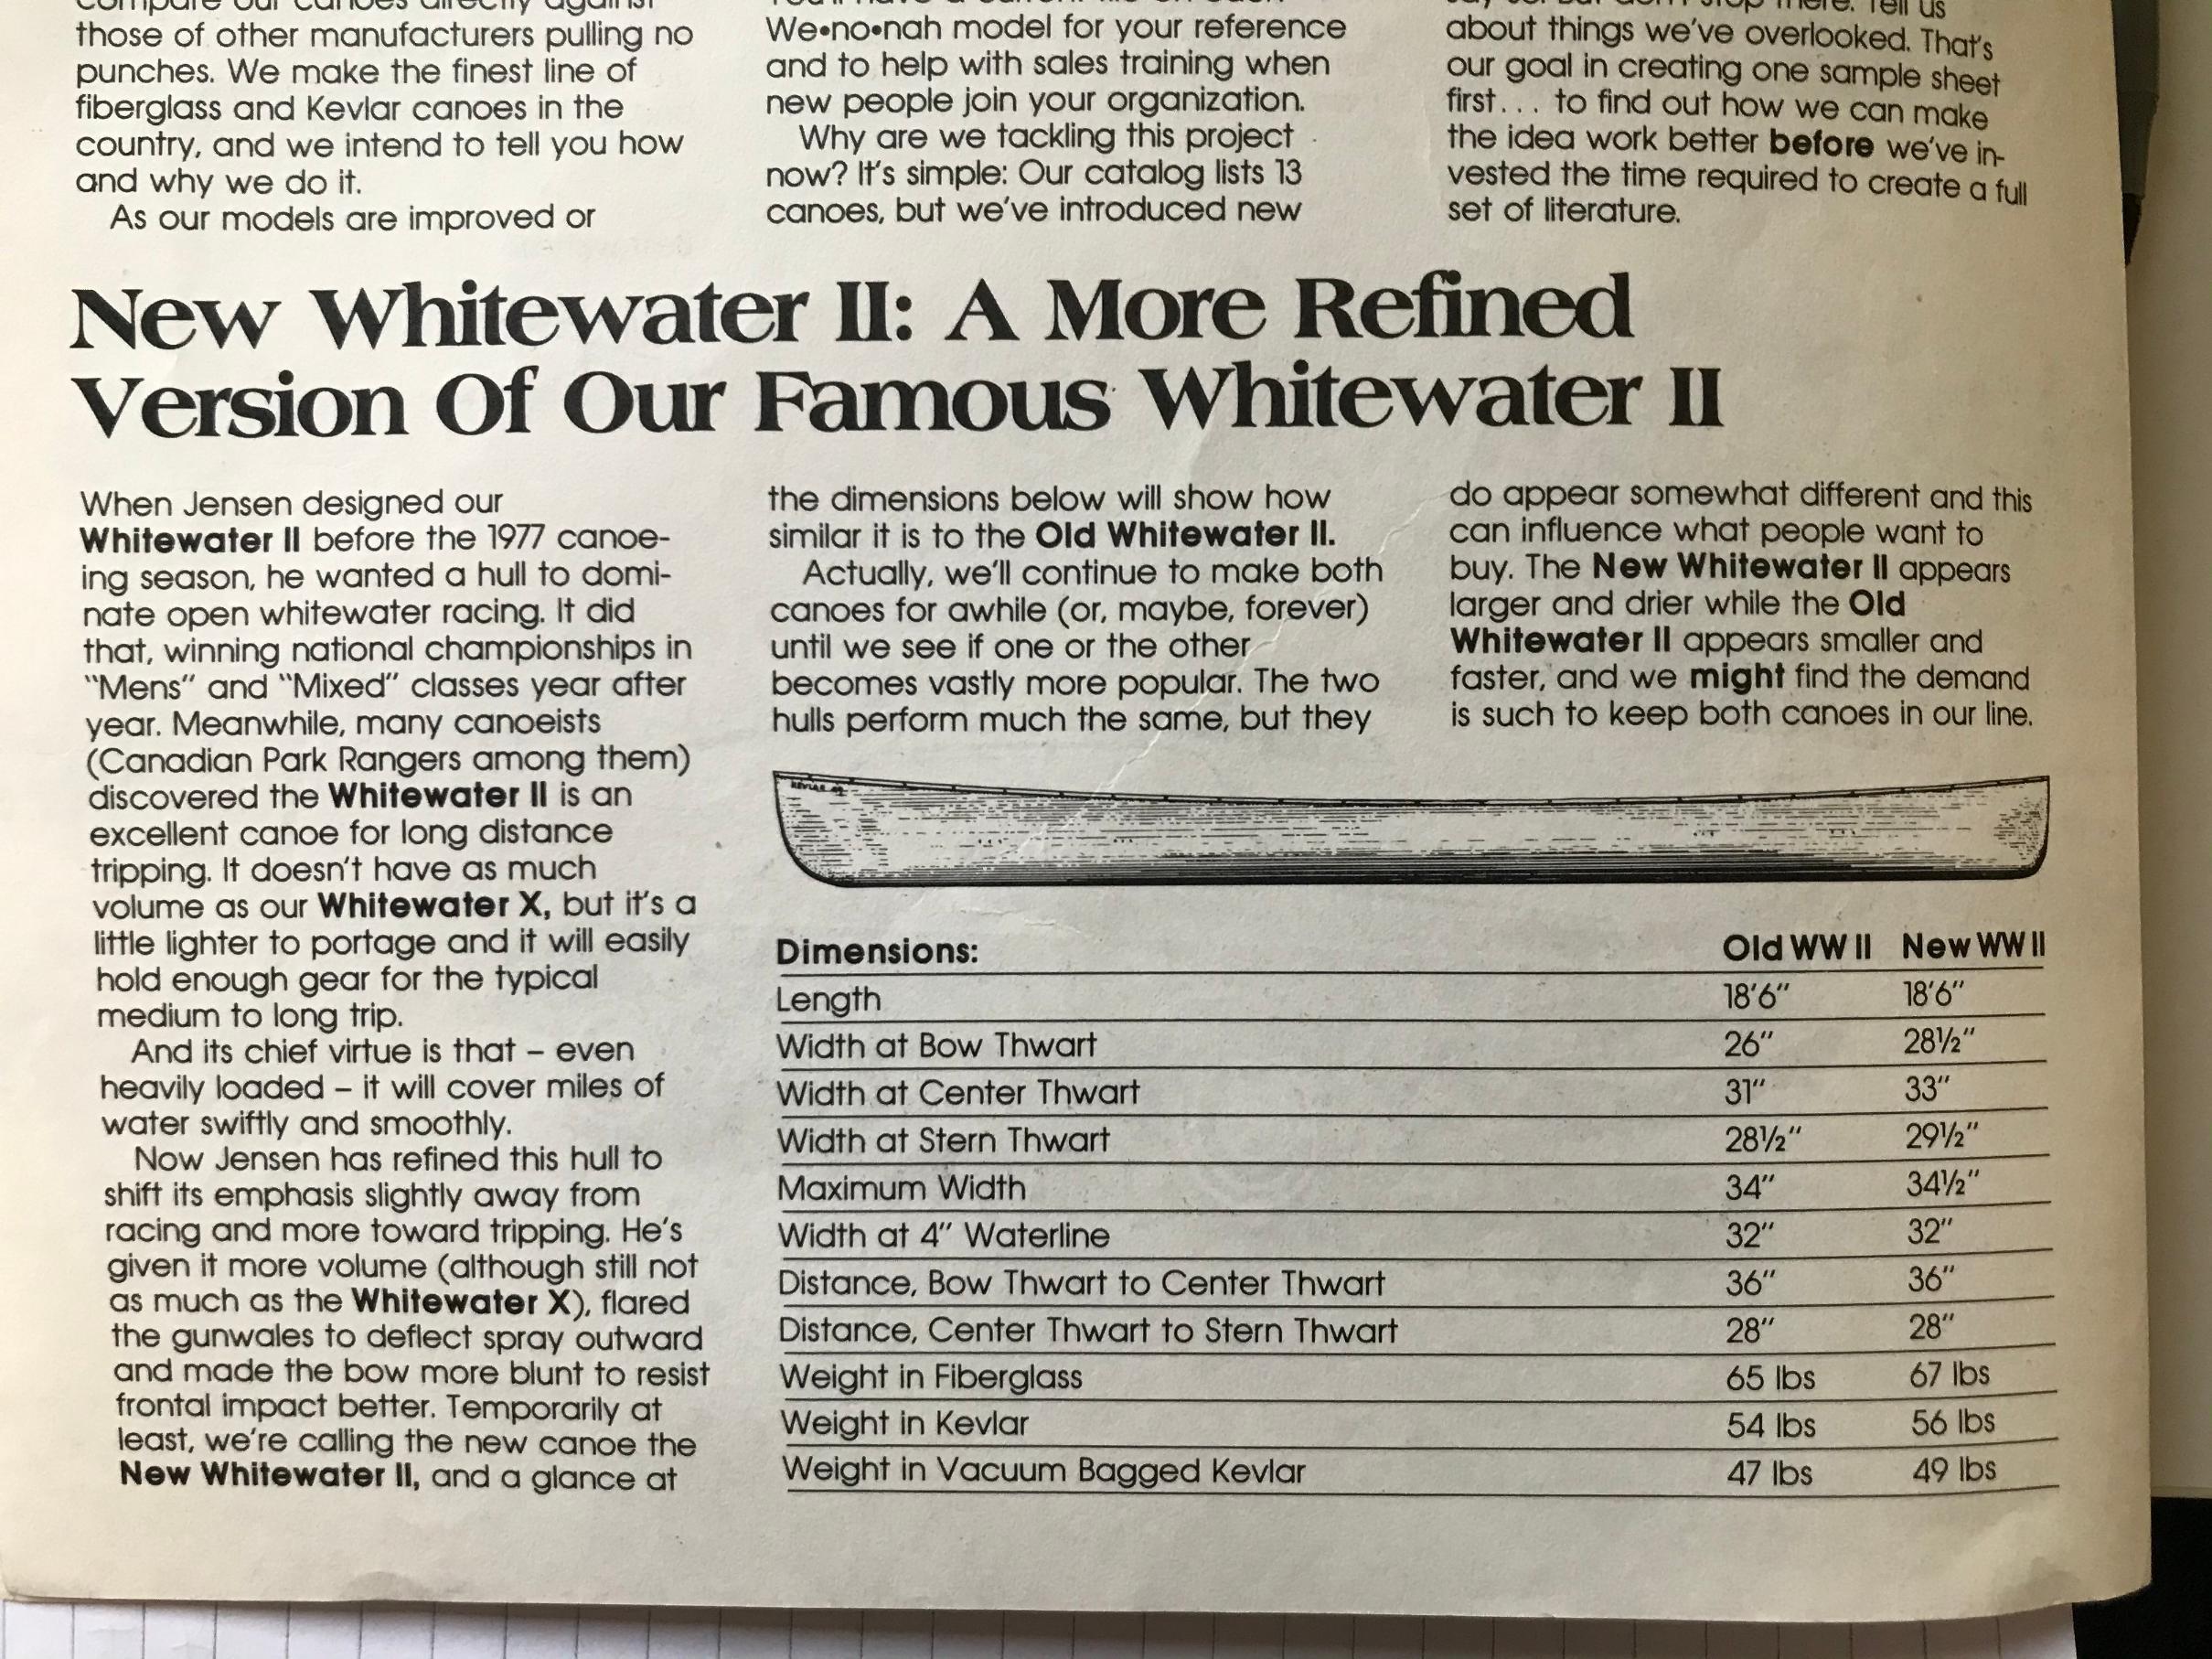 New Whitewater II